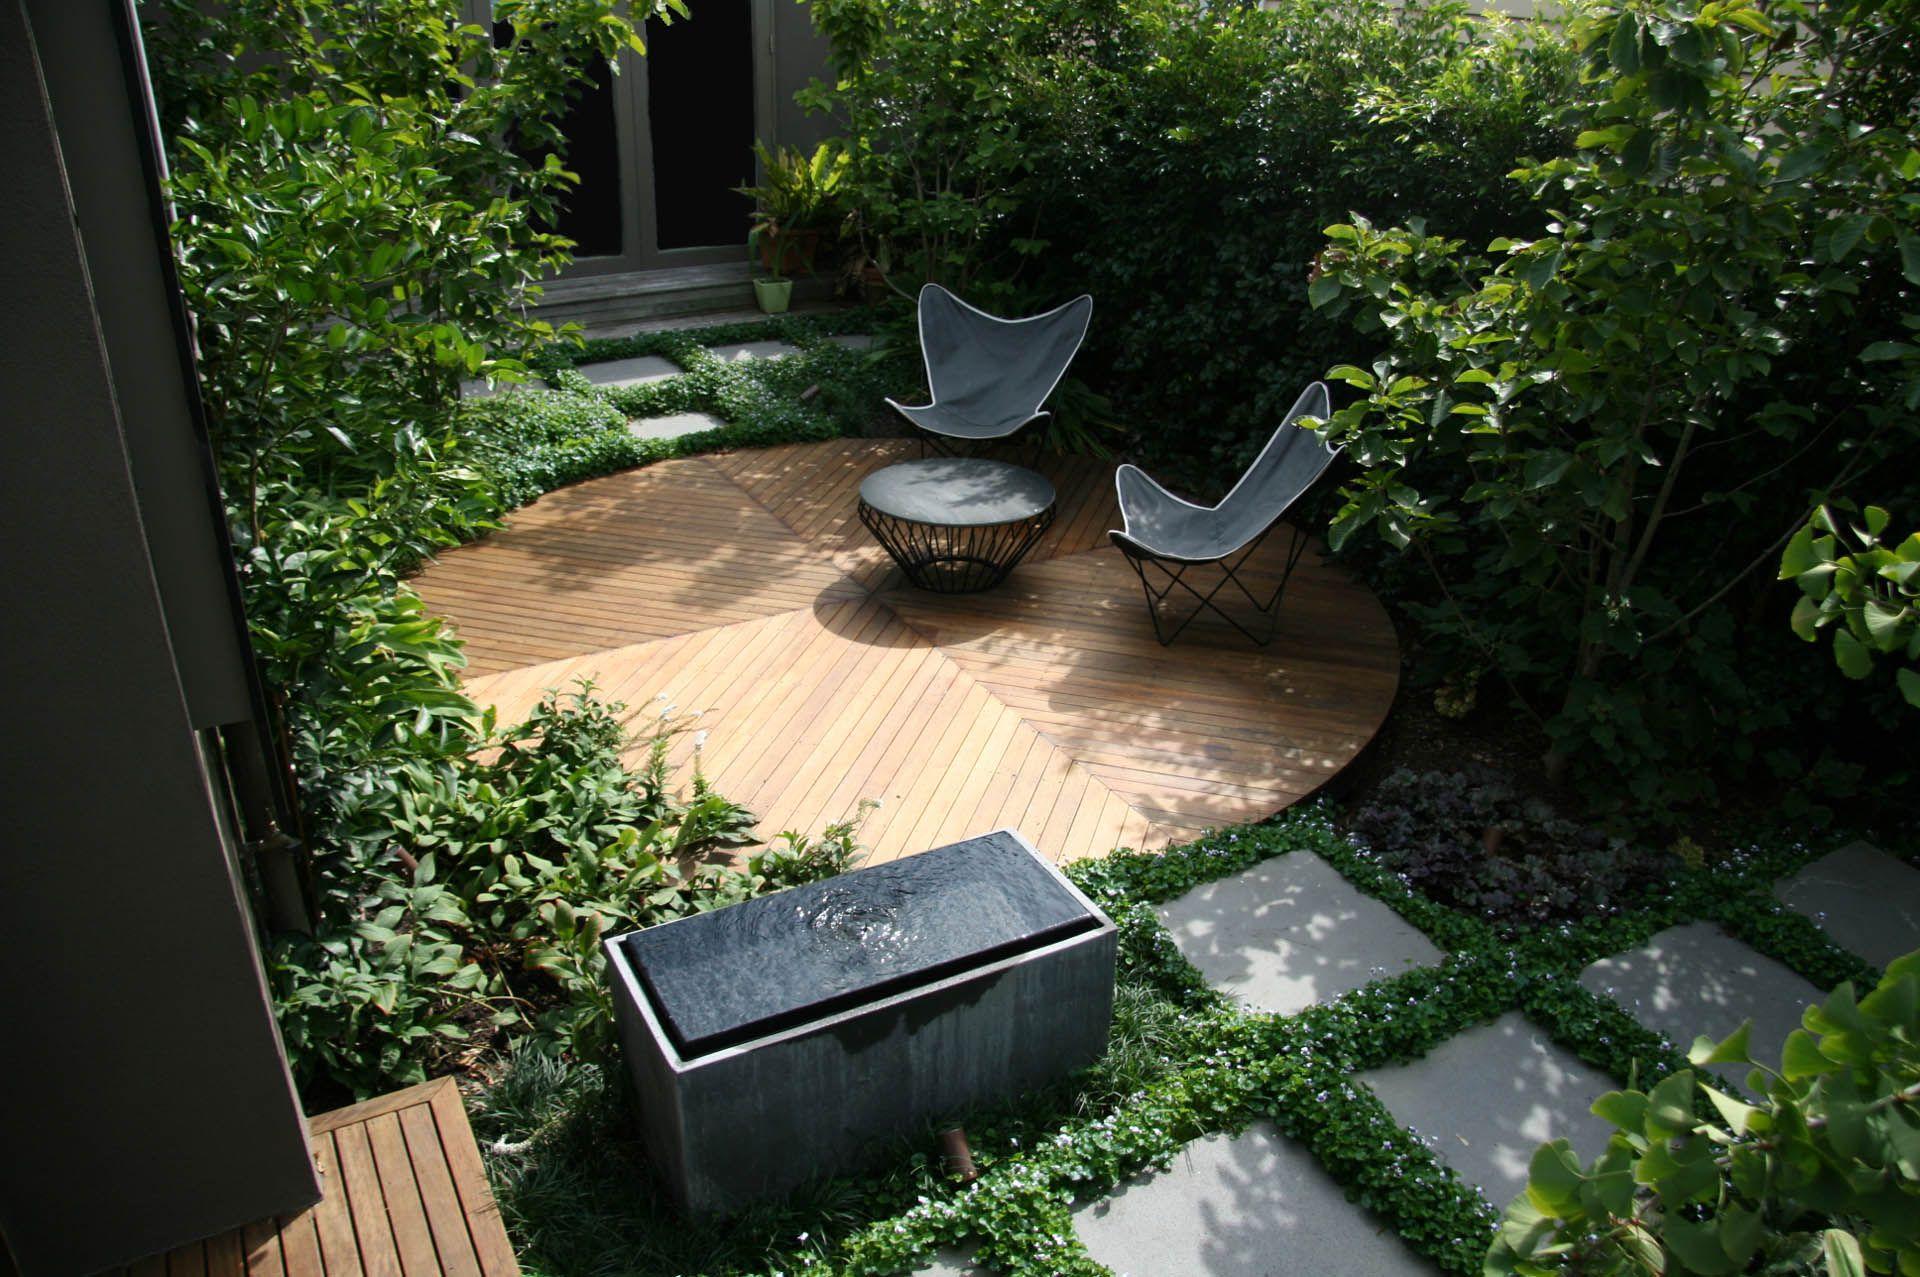 dark and stylish contemporary garden design | adamchristopherdesign.co.uk